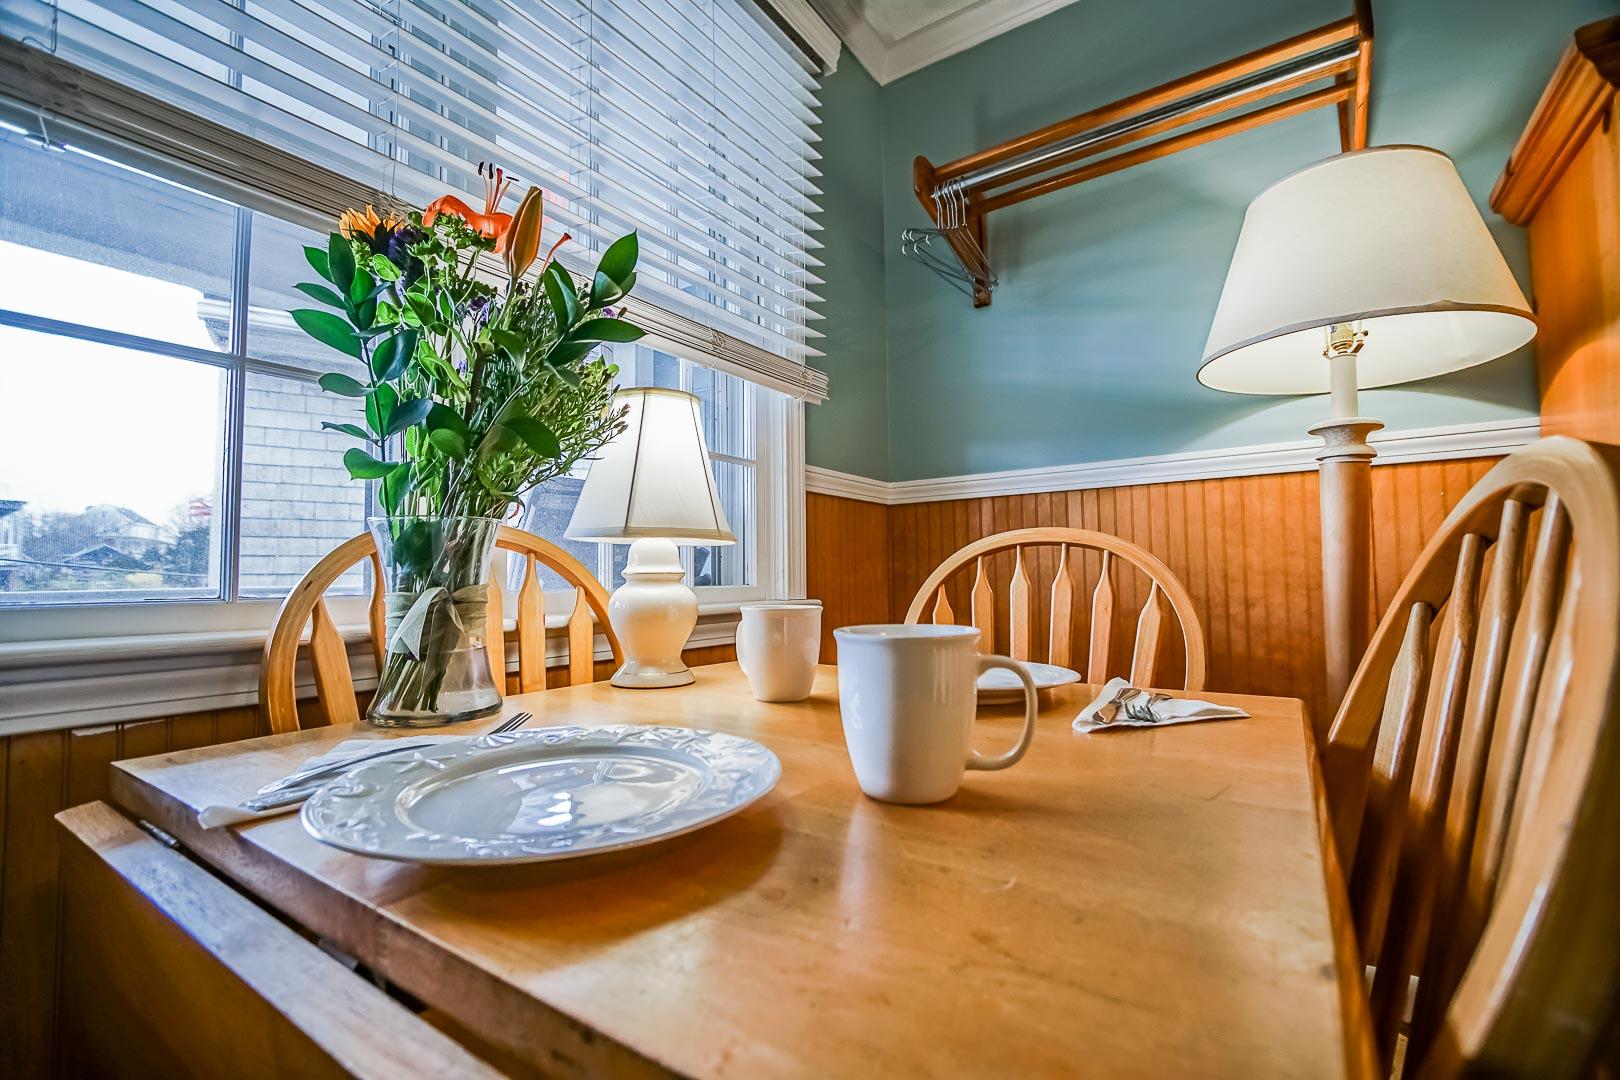 A beautiful dining area at VRI's Island Manor Resort in Rhode Island.